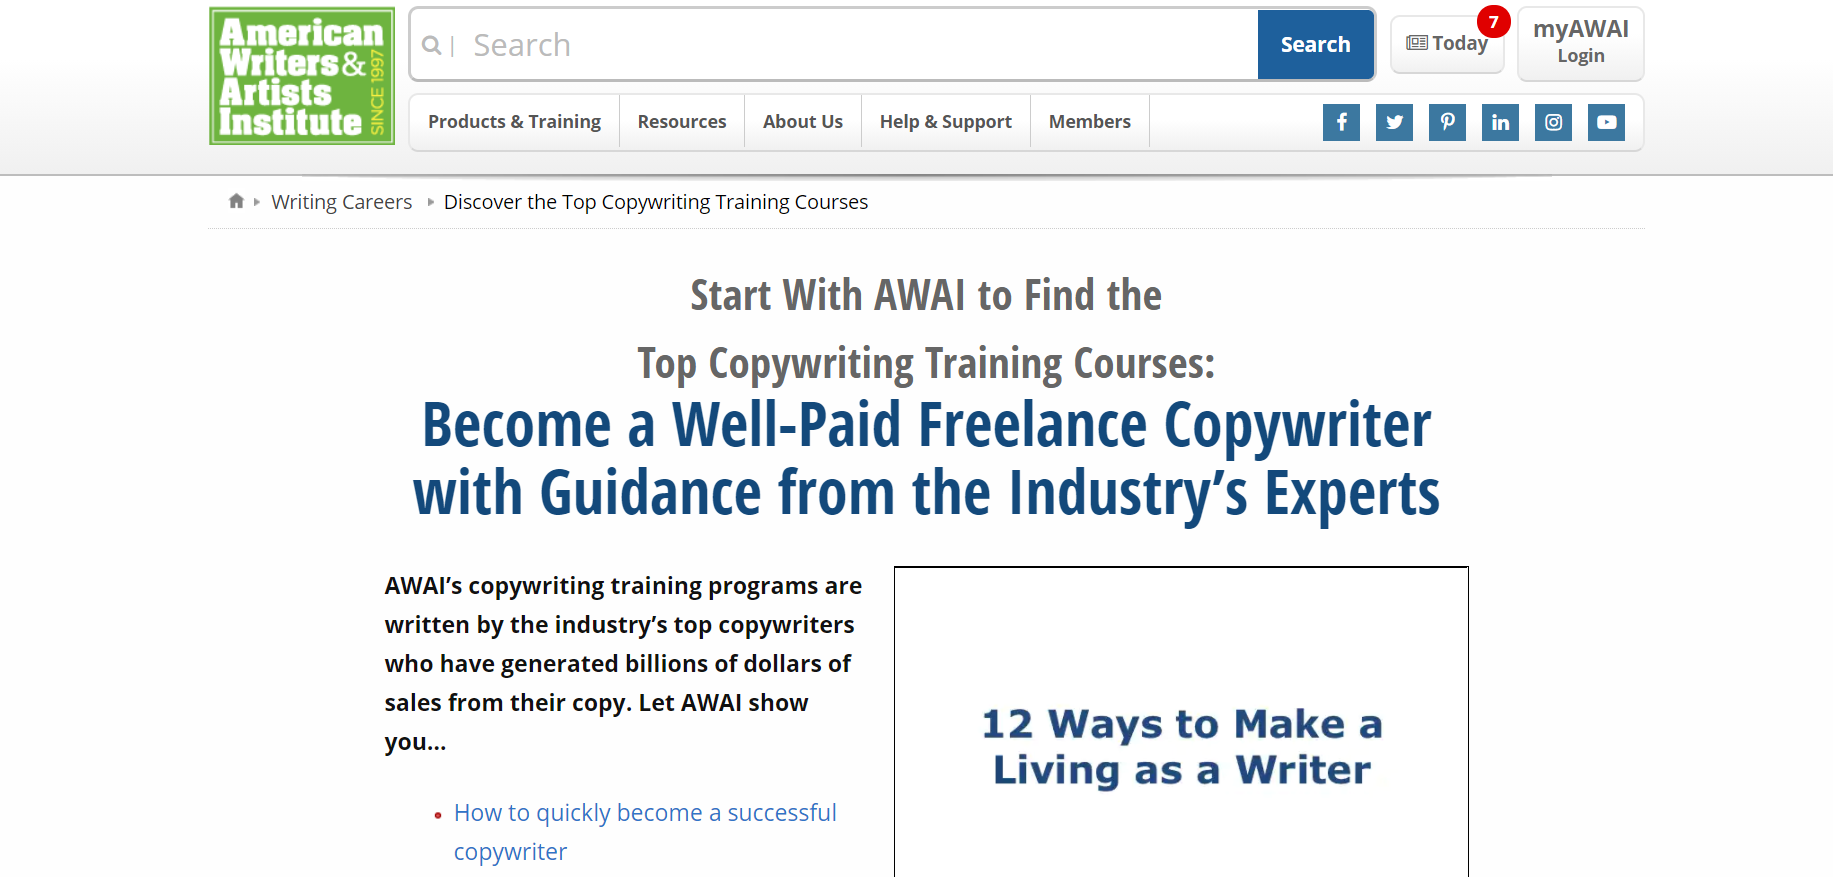 Landing page image for Copywriting Course AWAI